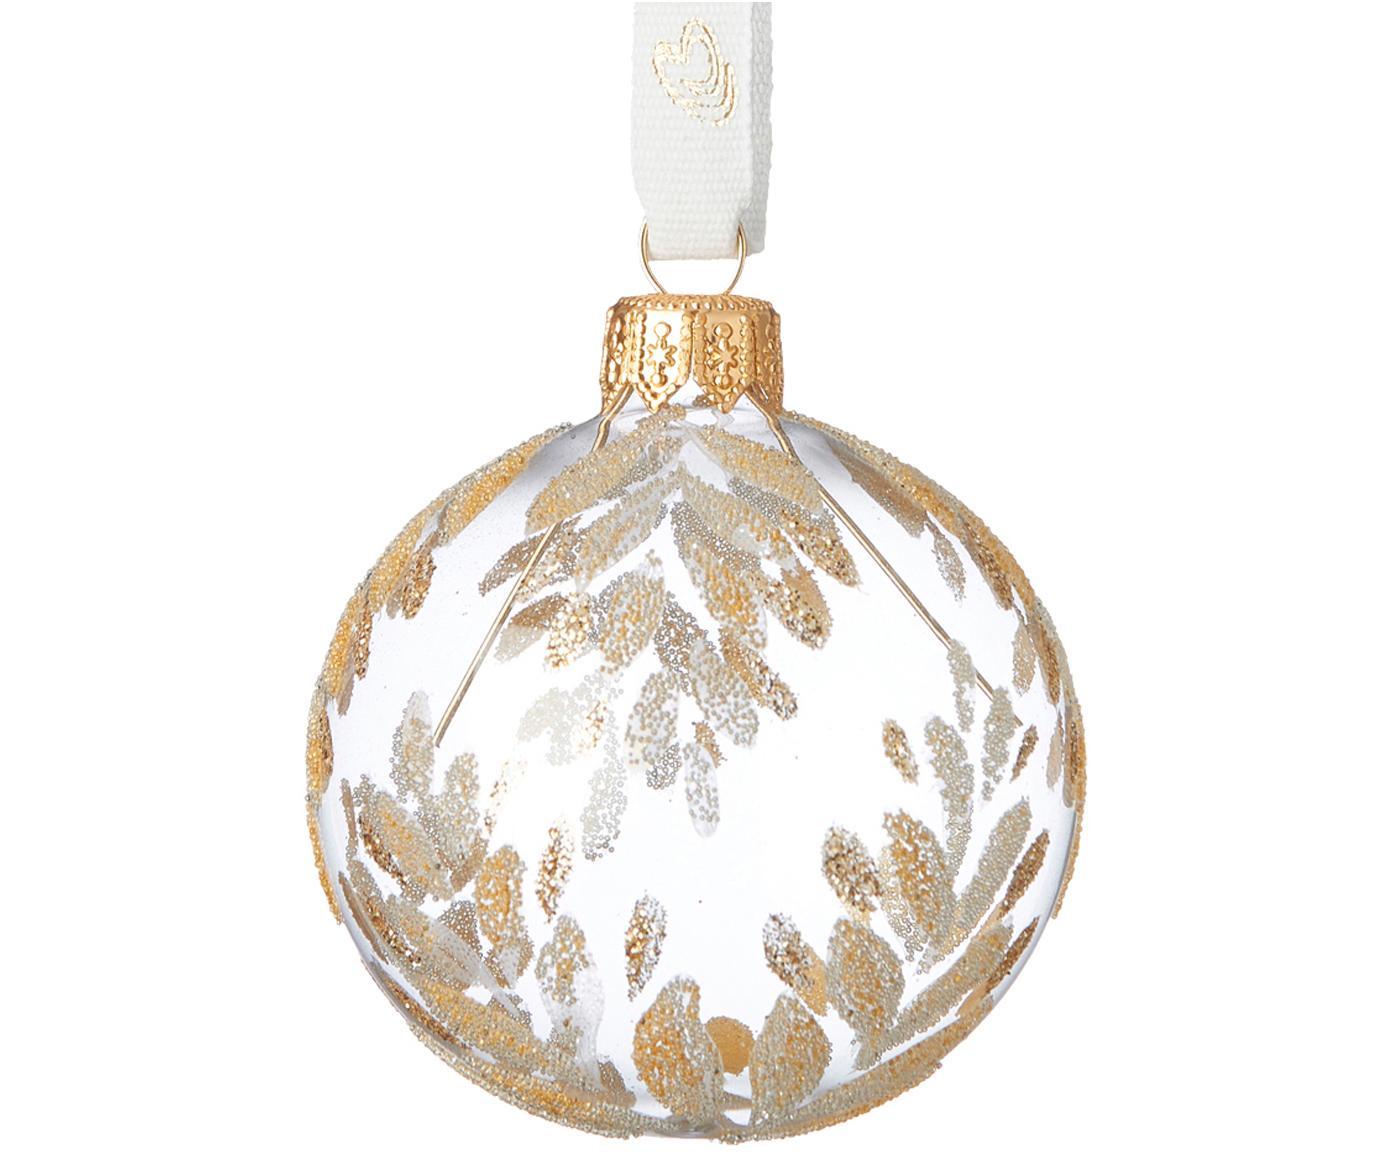 Weihnachtskugeln Cadelia Ø6cm, 2Stück, Transparent, Goldfarben, Ø 6 cm